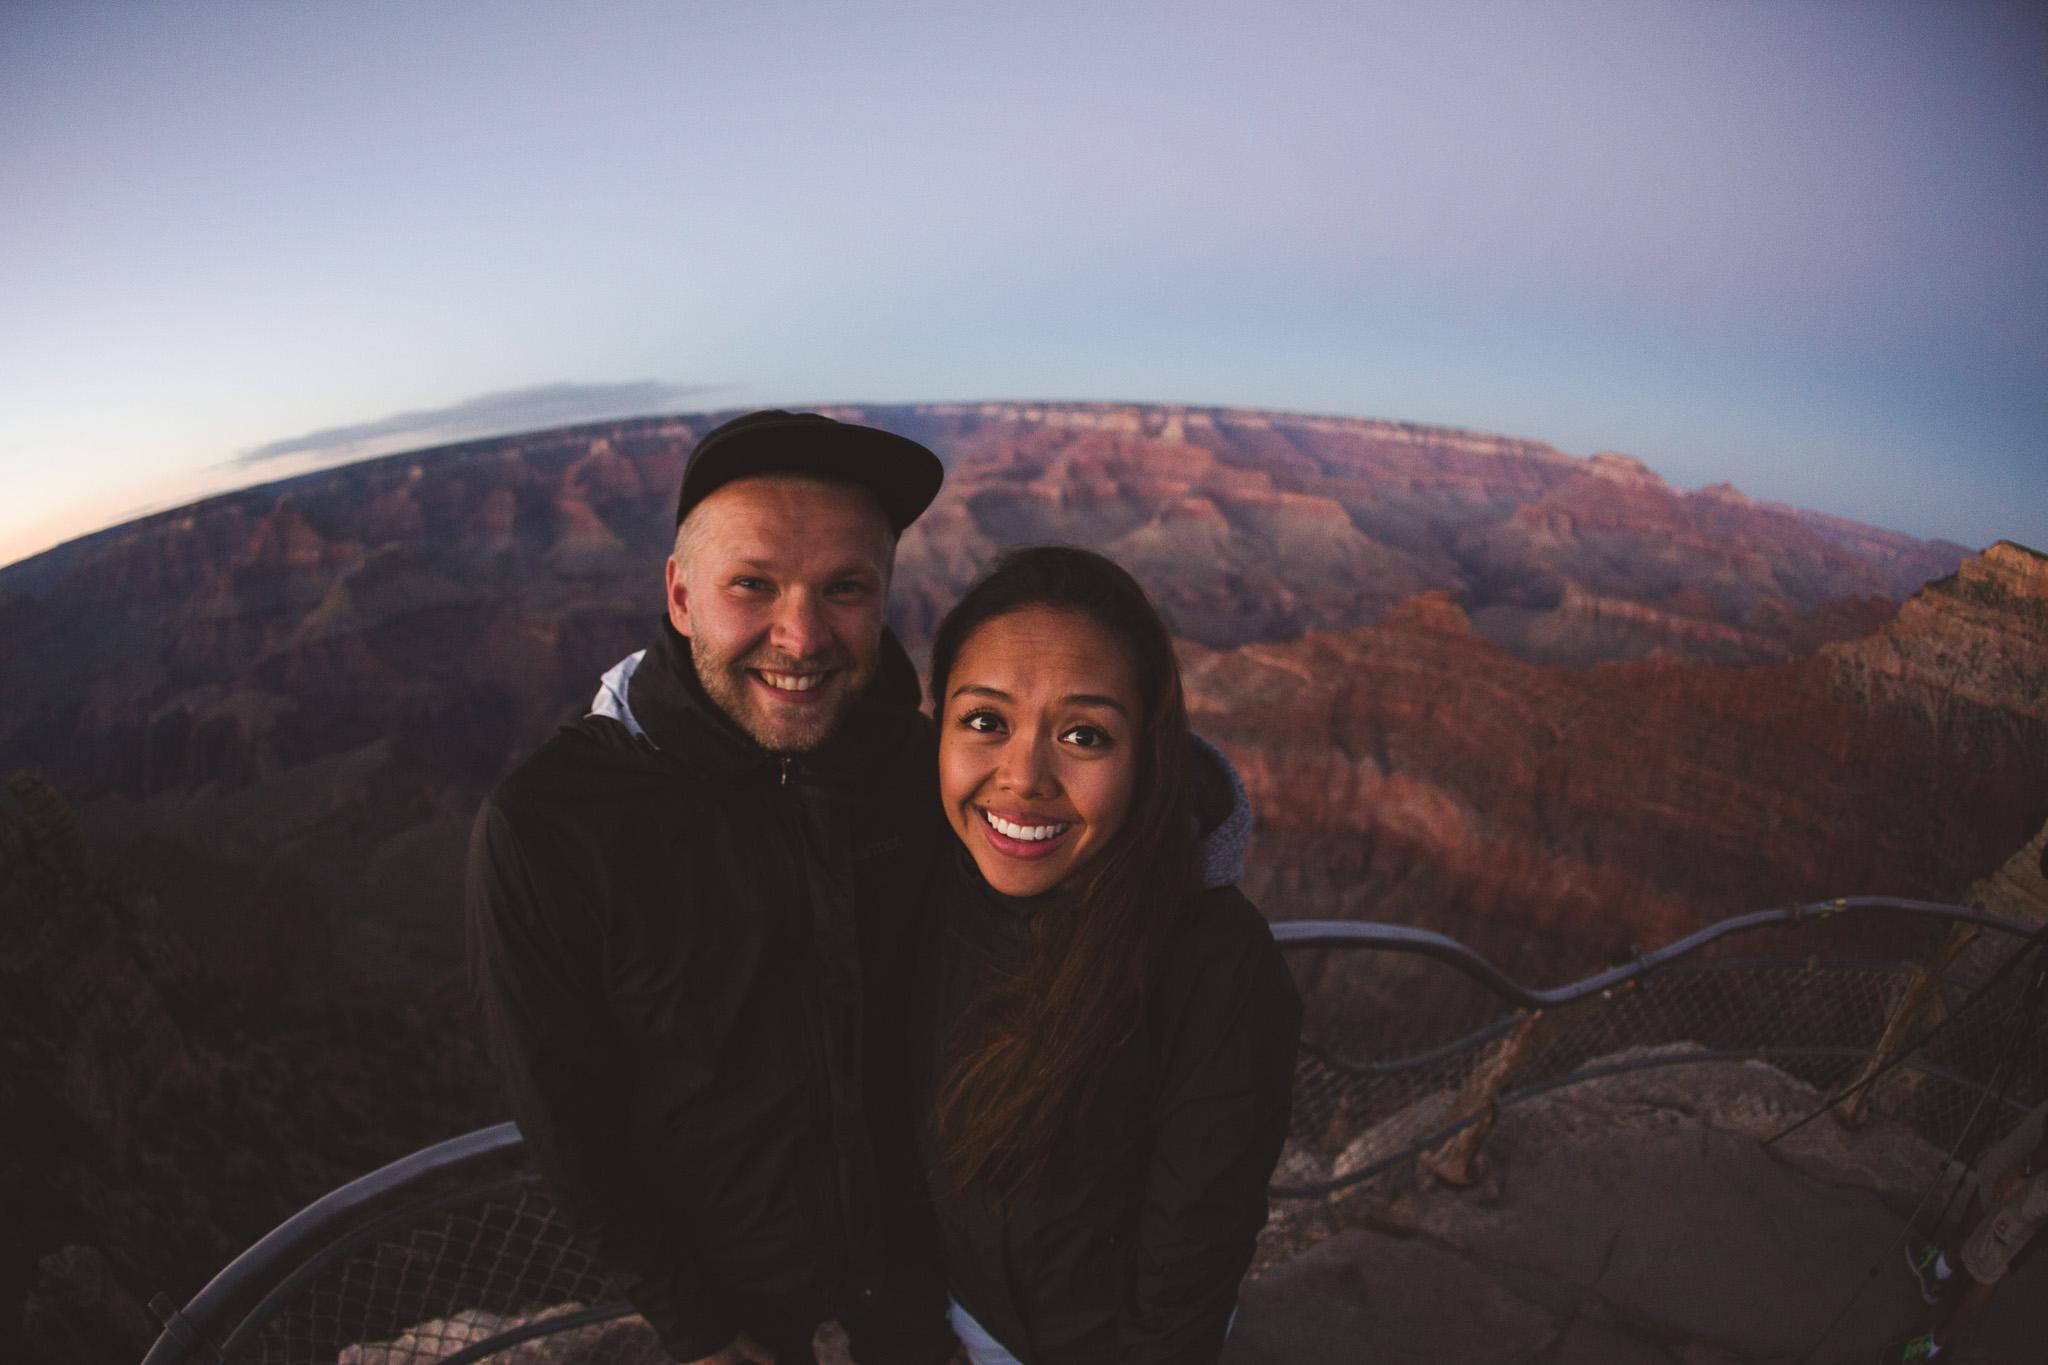 morning-light-at-the-grand-canyon